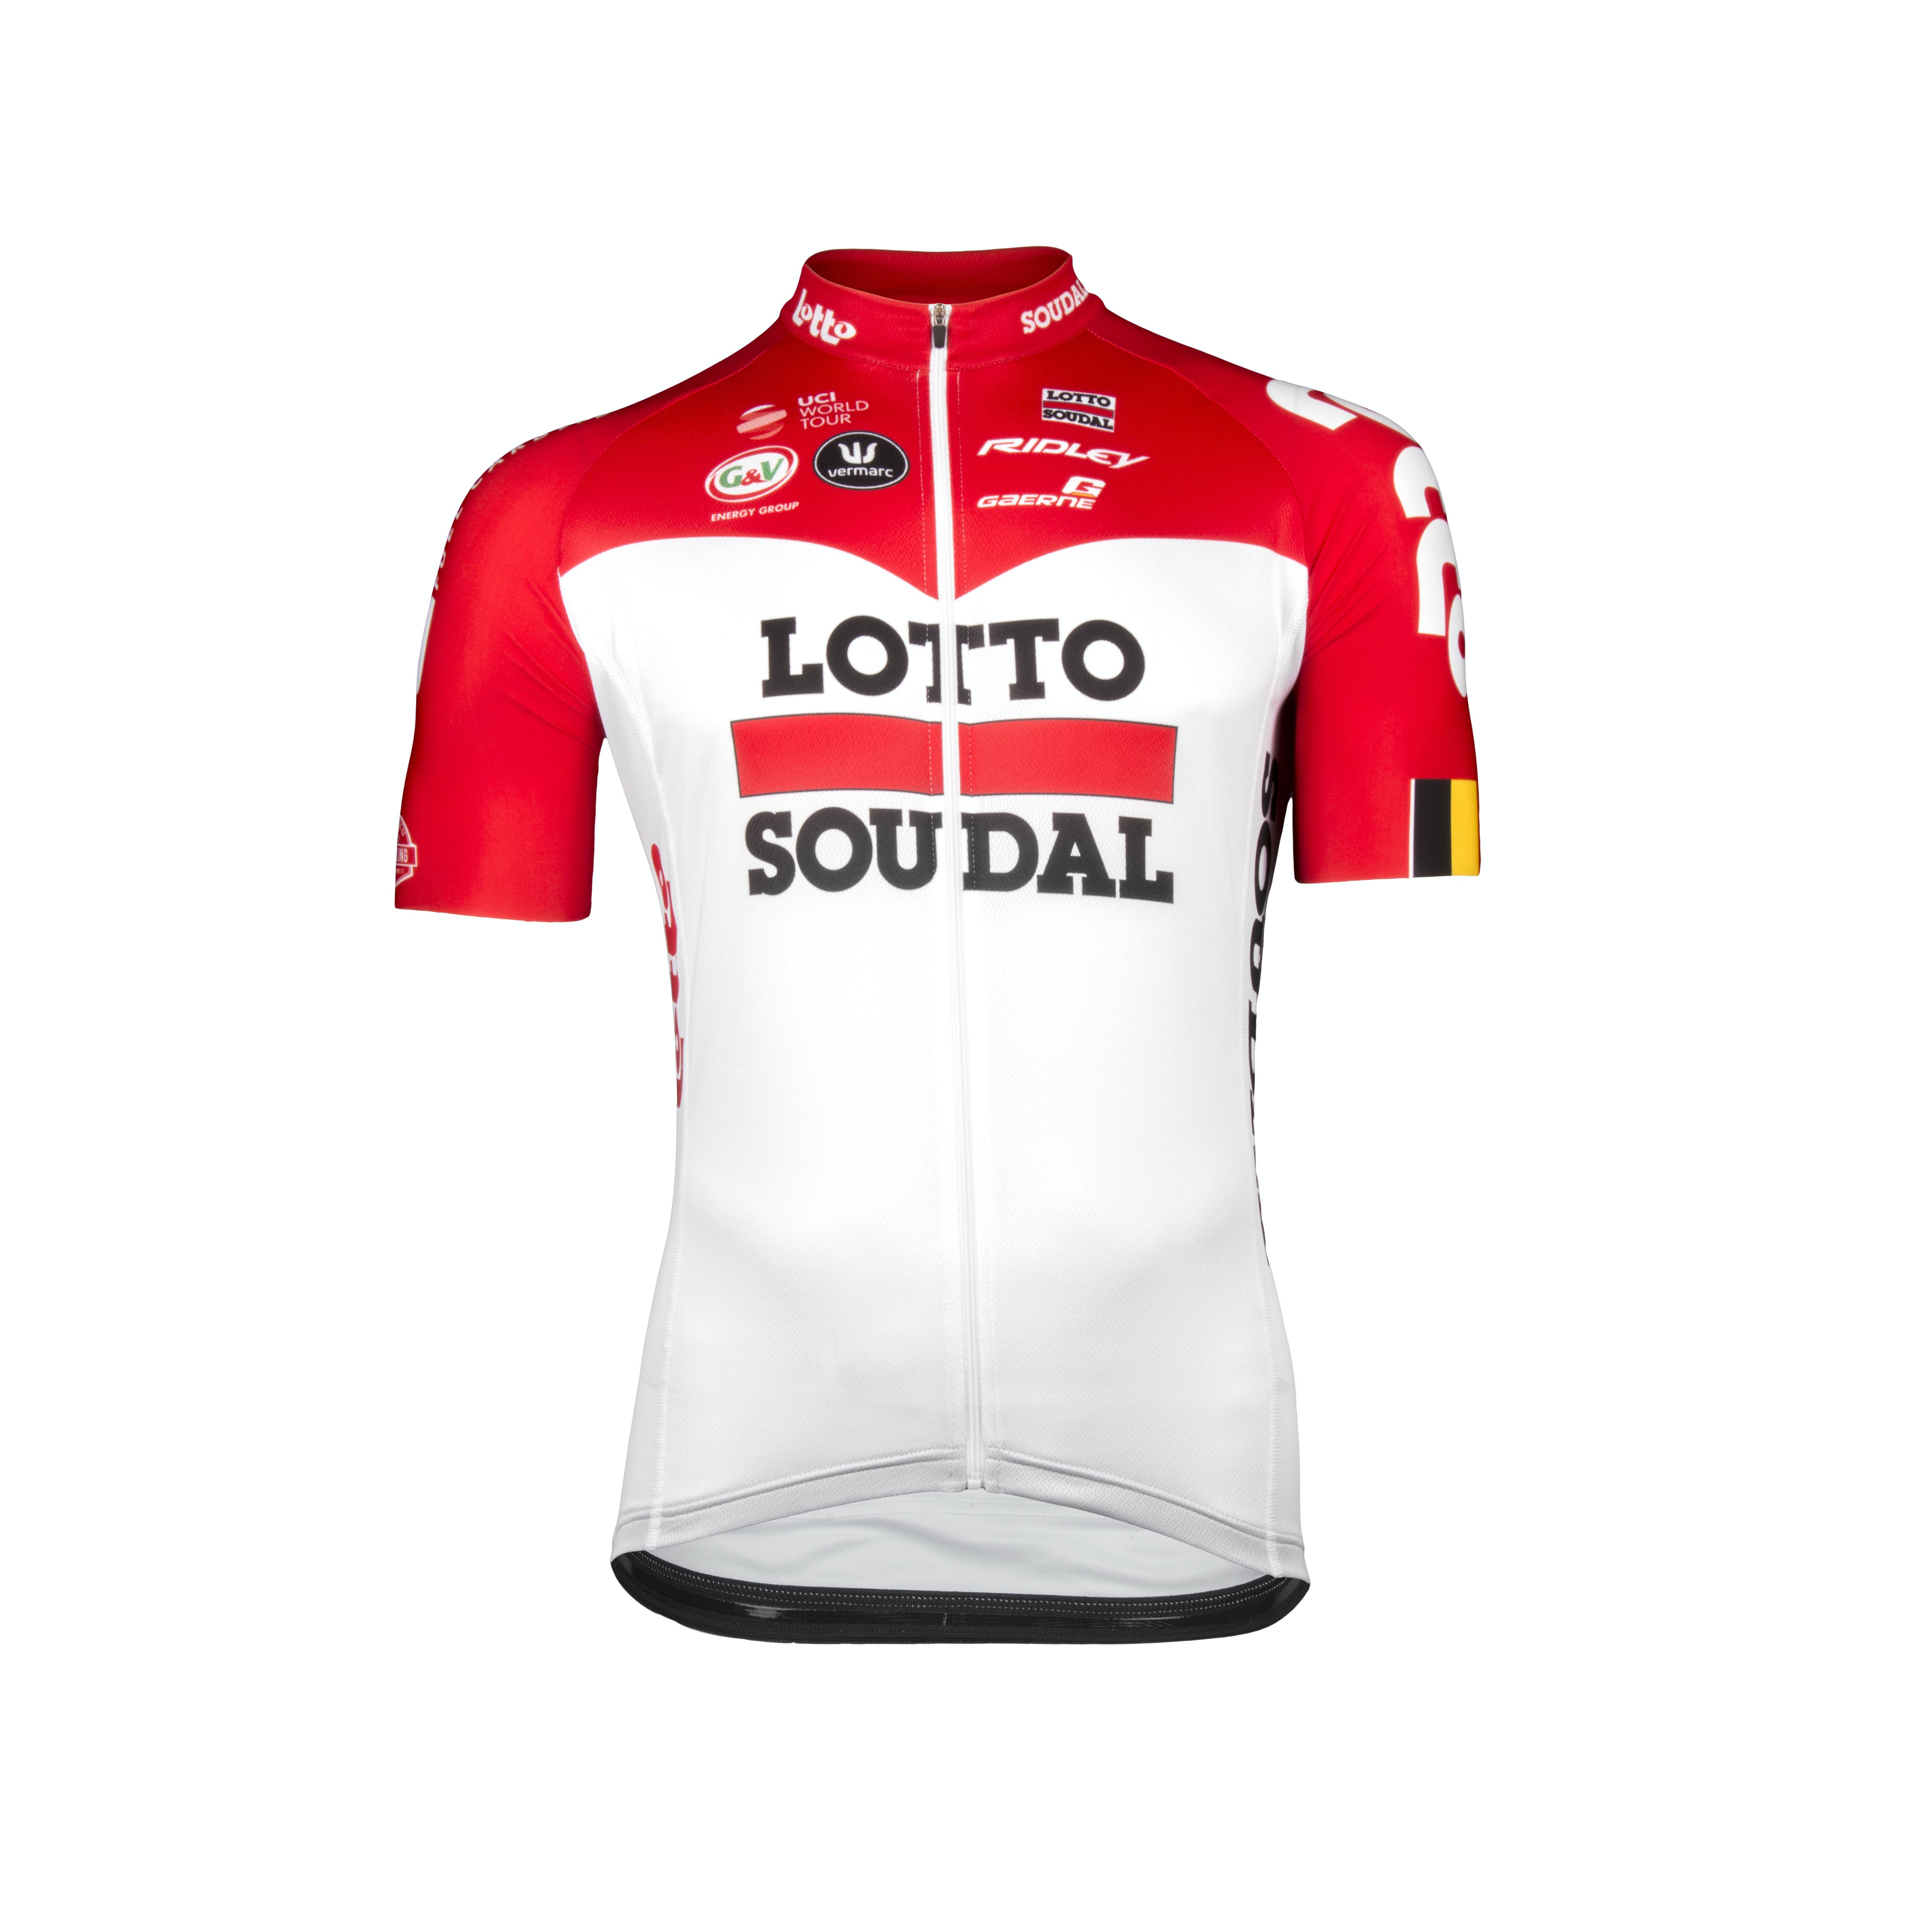 Lotto Soudal 2018 Trui Korte Mouwen Aero